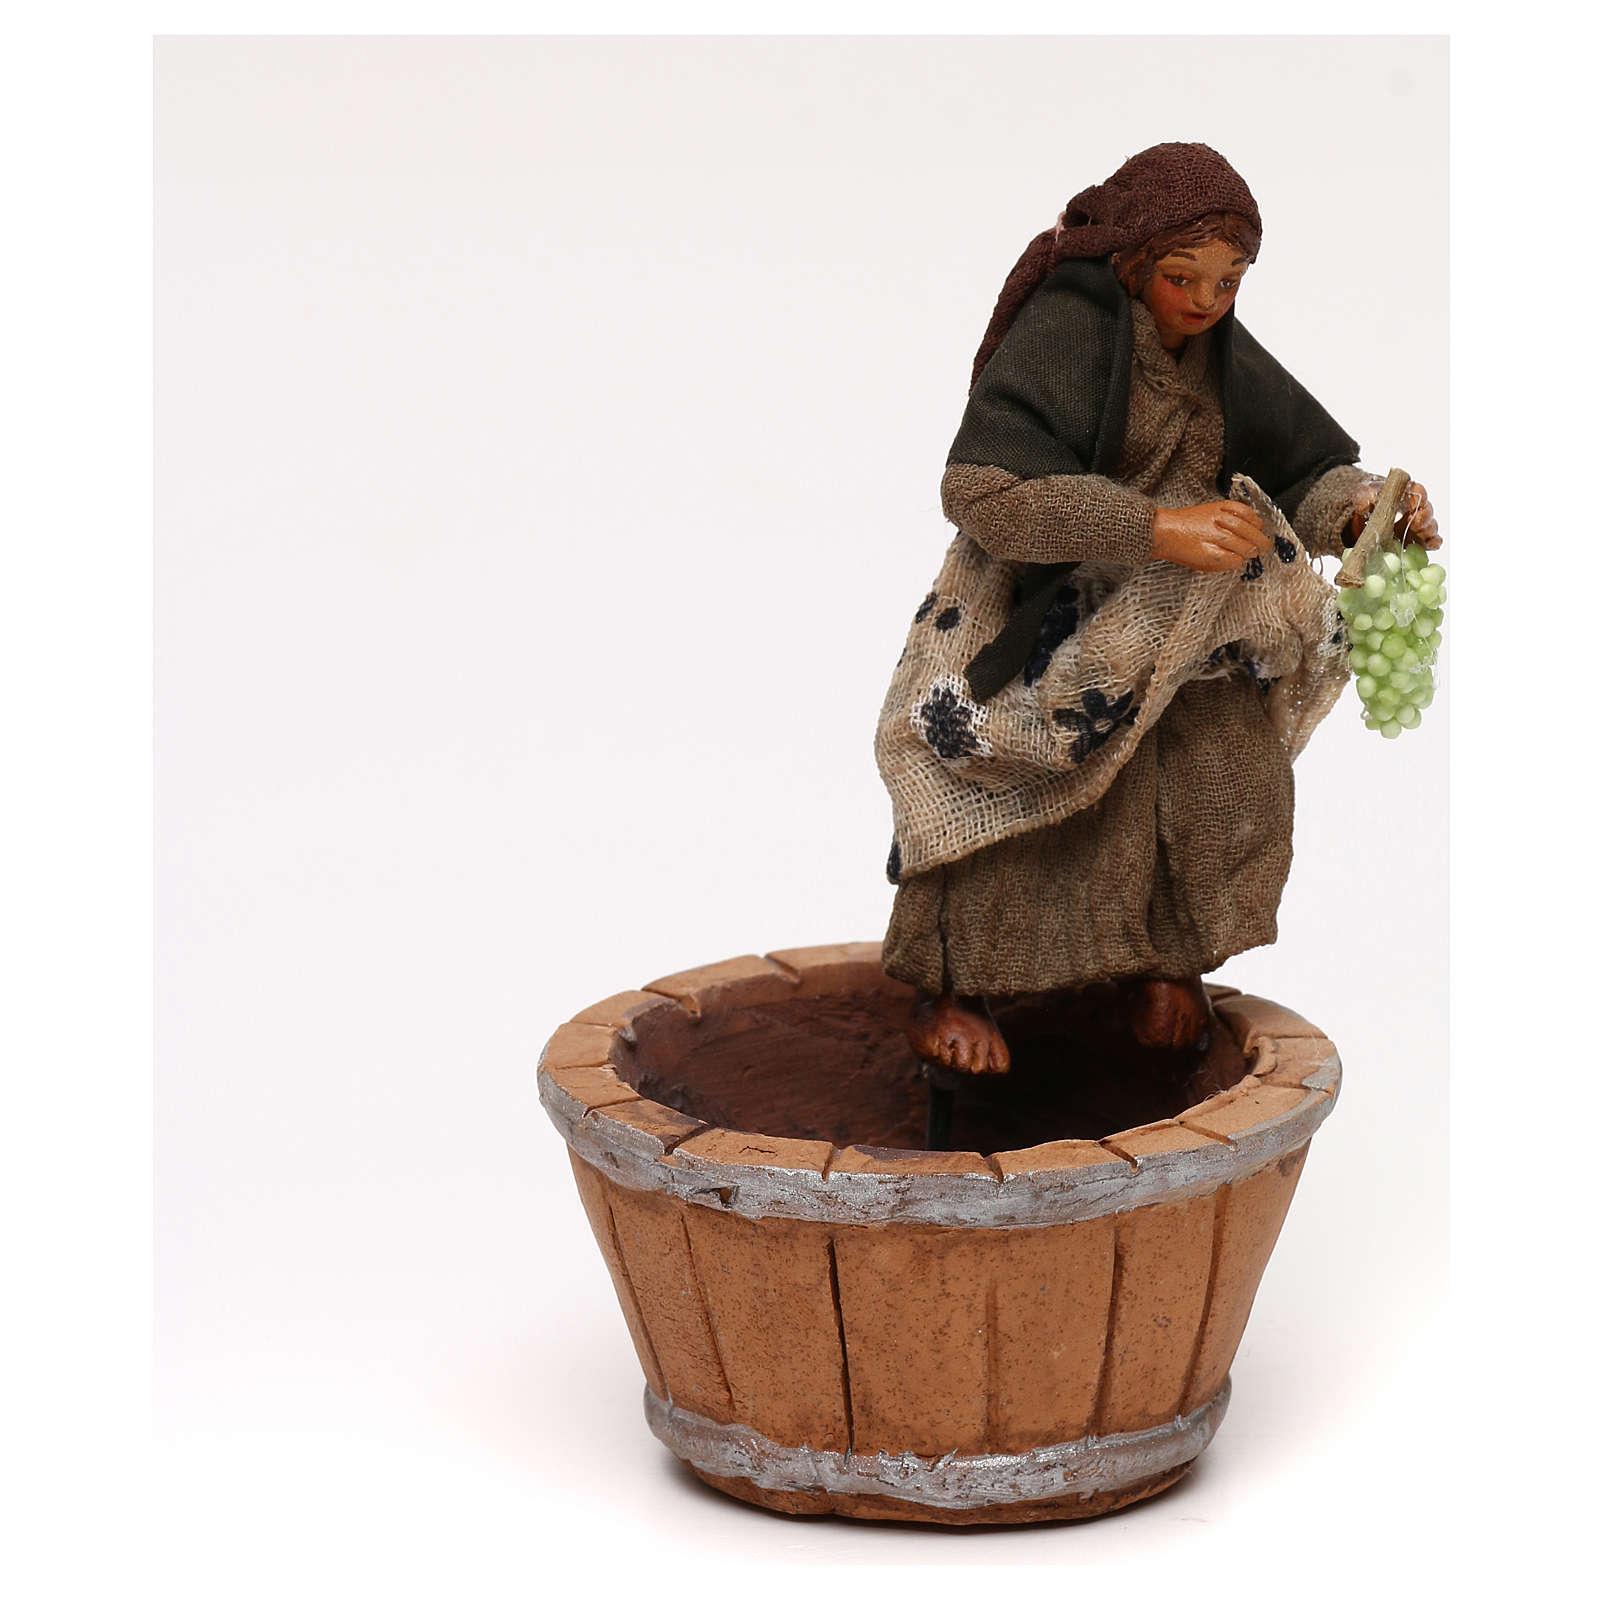 Donna che pigia l'uva presepe napoletano 10 cm 4